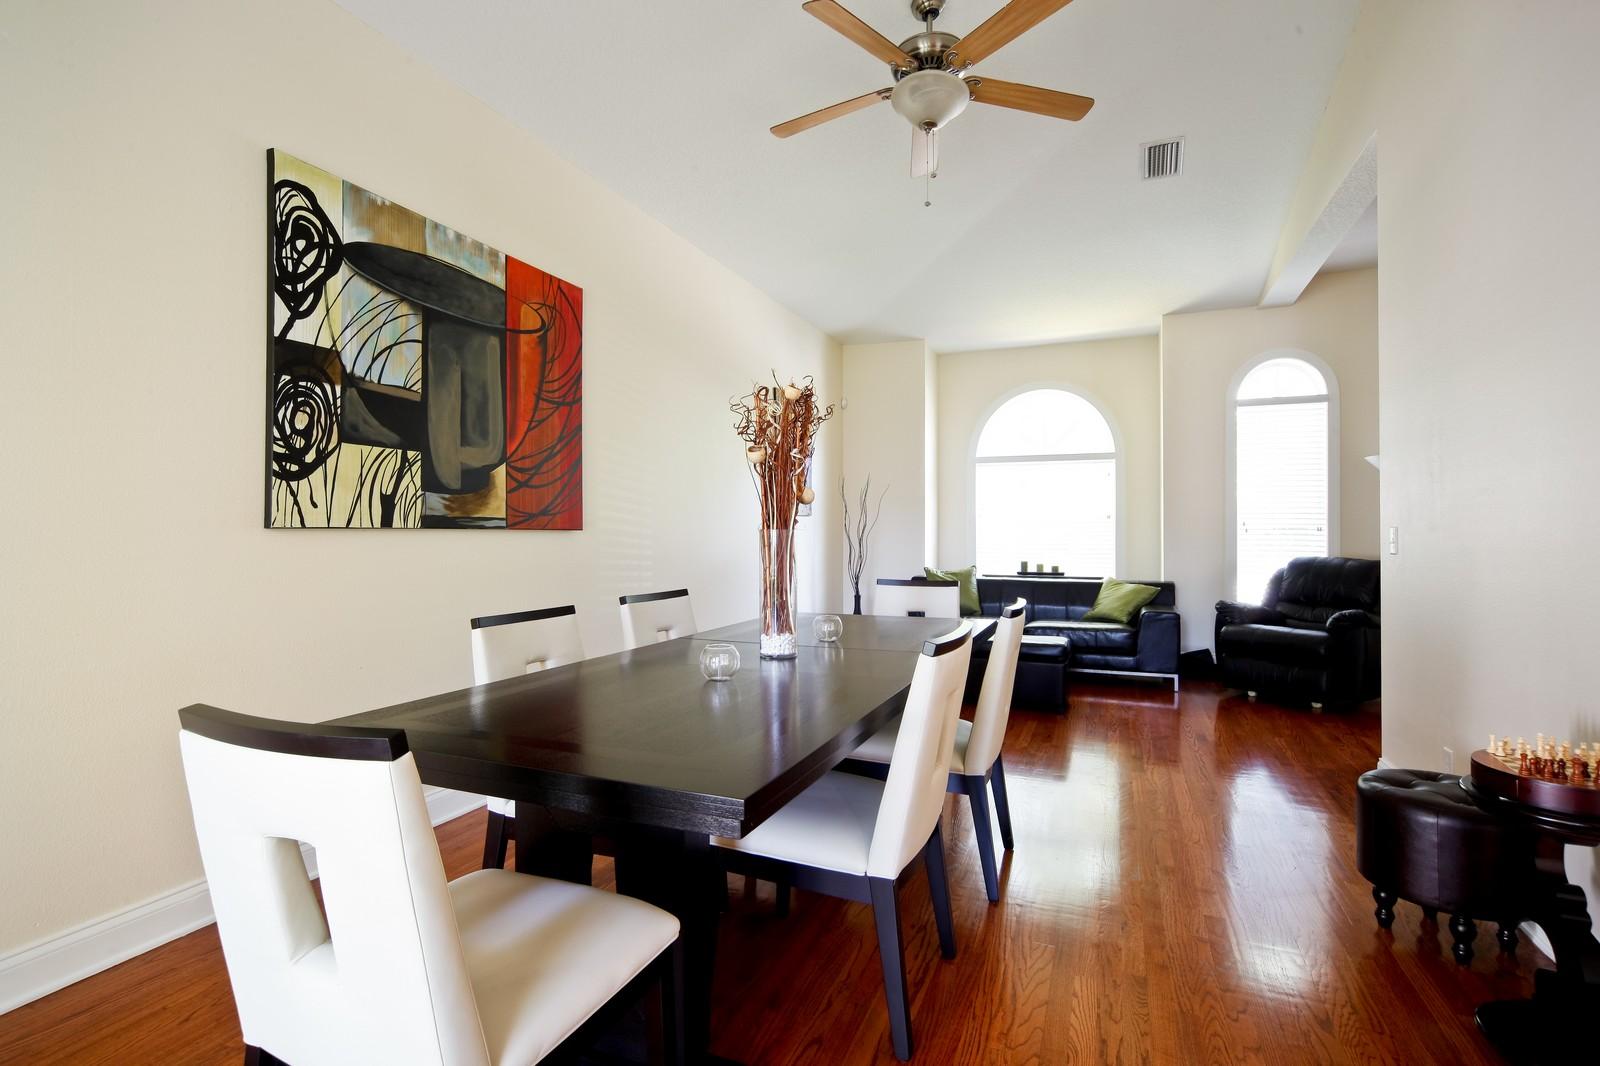 Real Estate Photography - 3812 El Prado Blvd, Tampa, FL, 33629 - Living Room / Dining Room